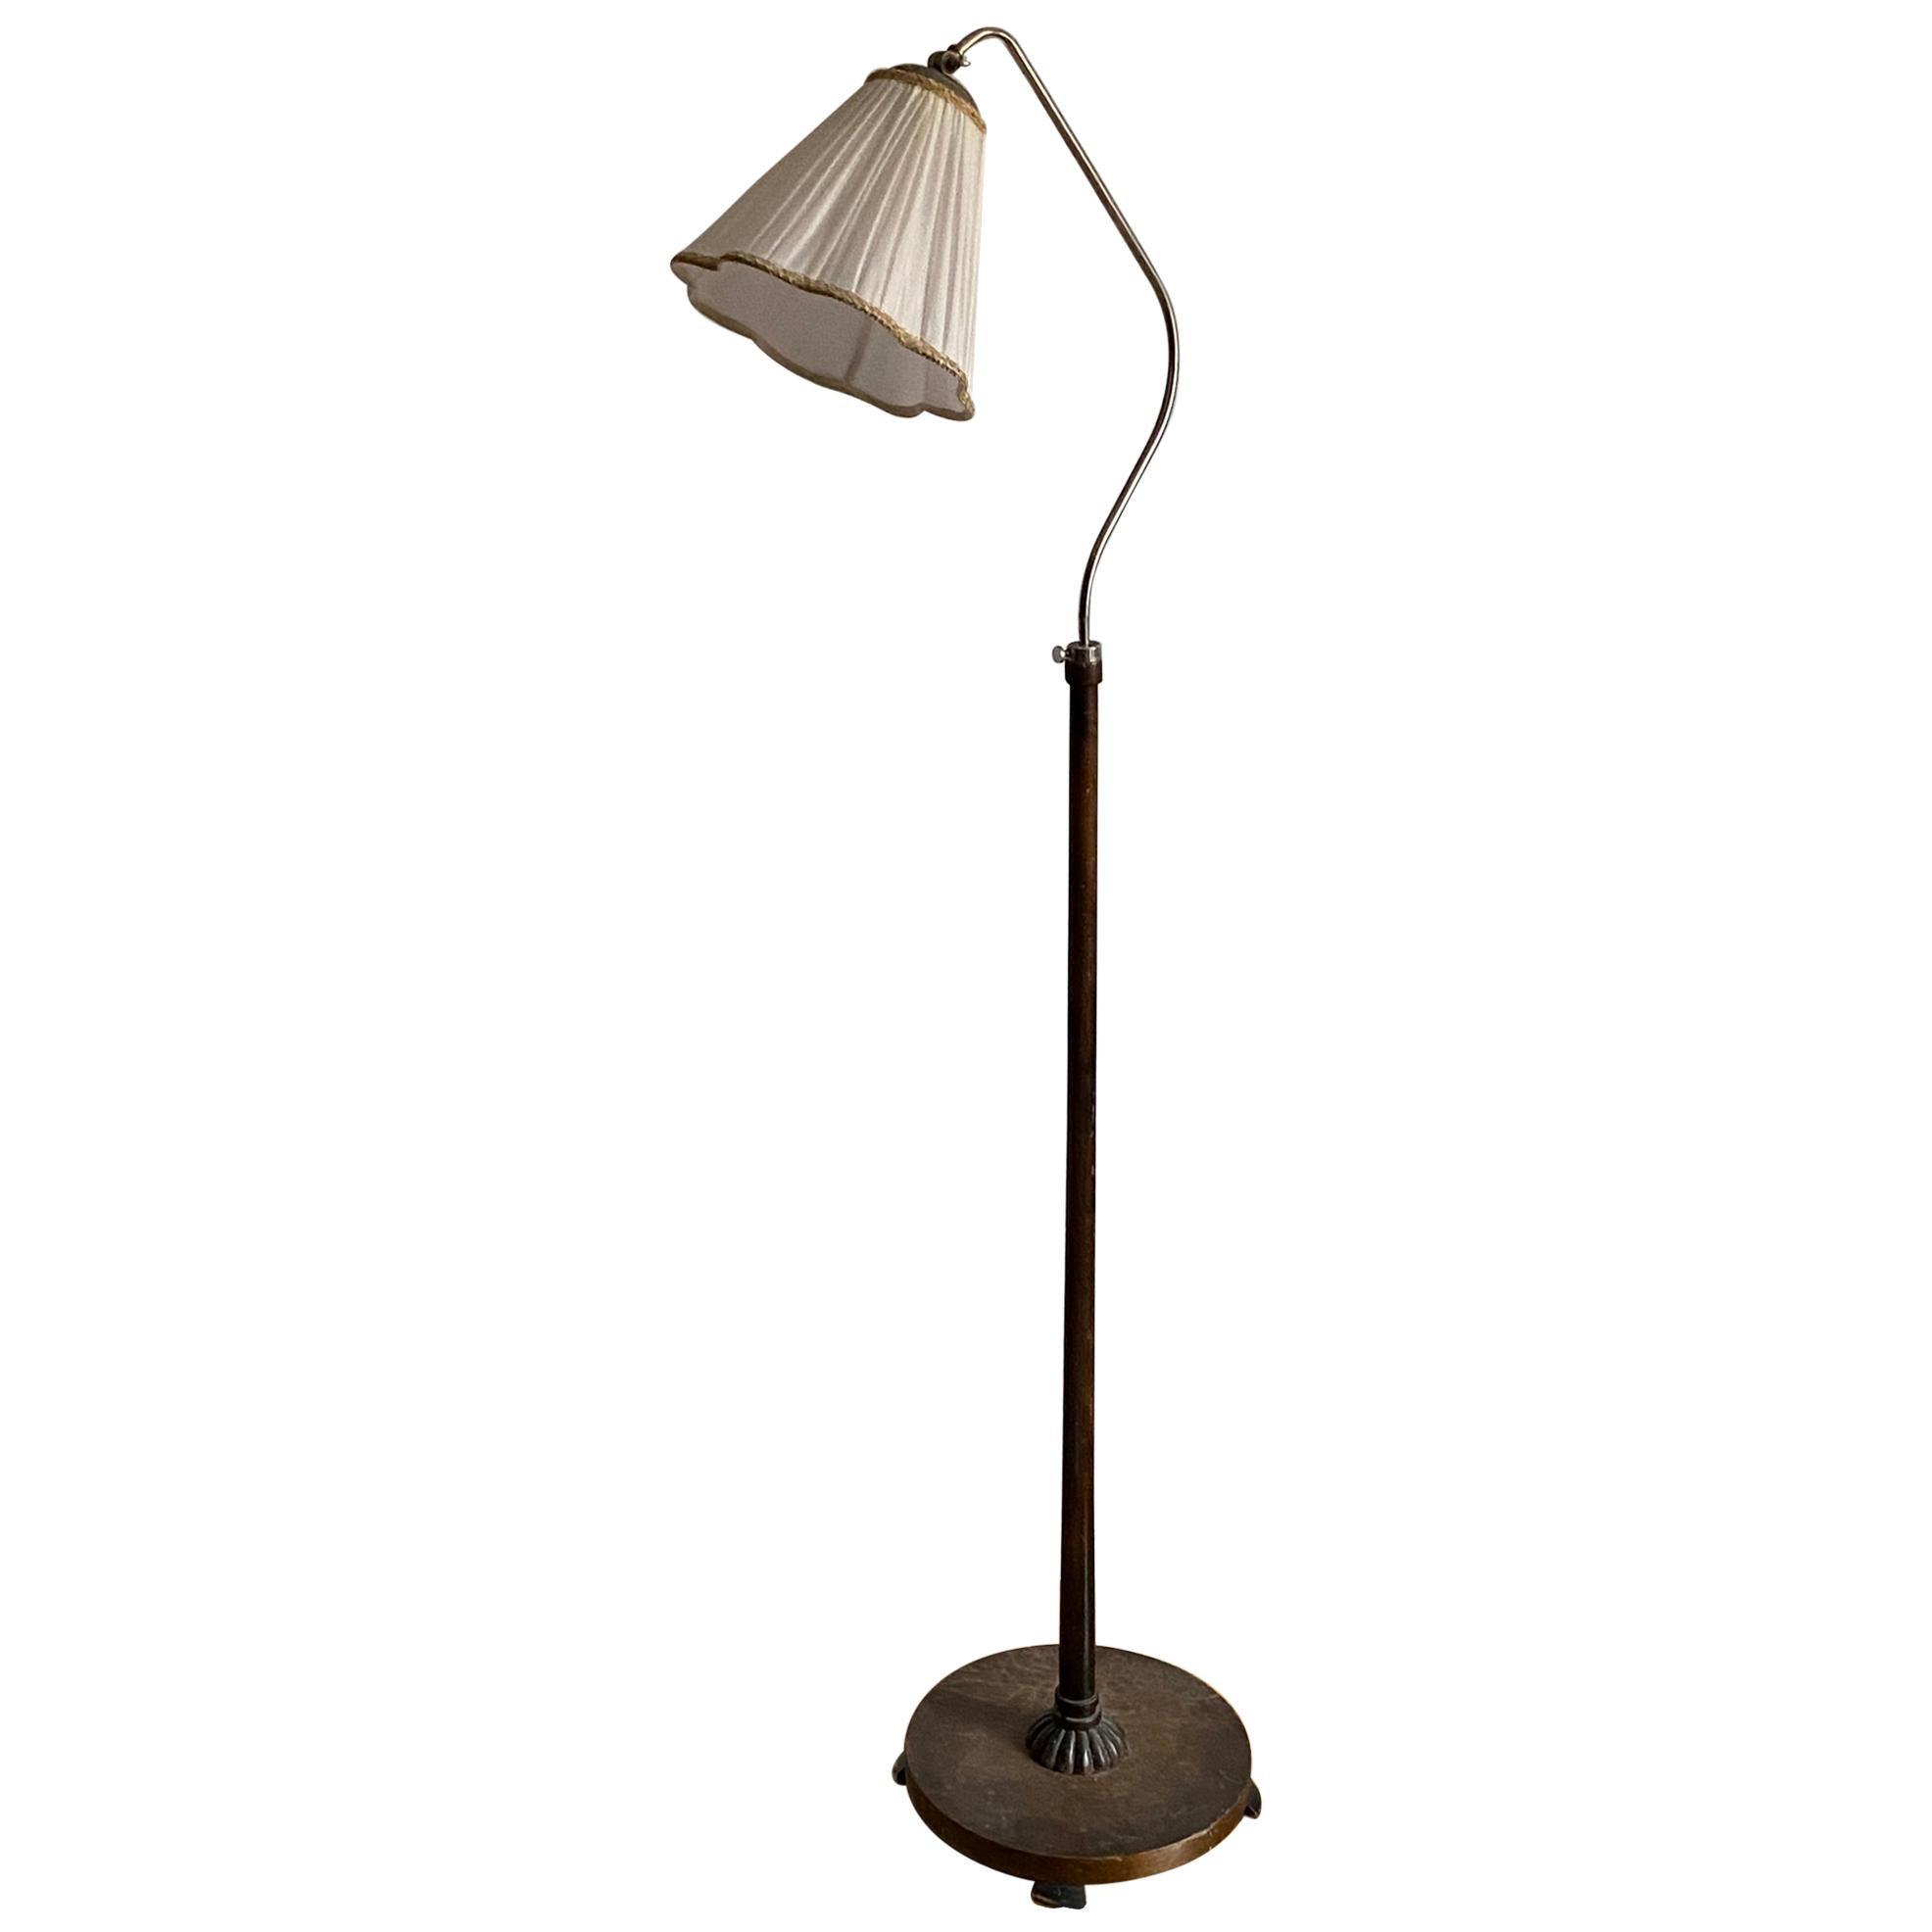 Swedish Designer, Organic Functionalist Floor Lamp, Metal, Wood, Fabric 1940s